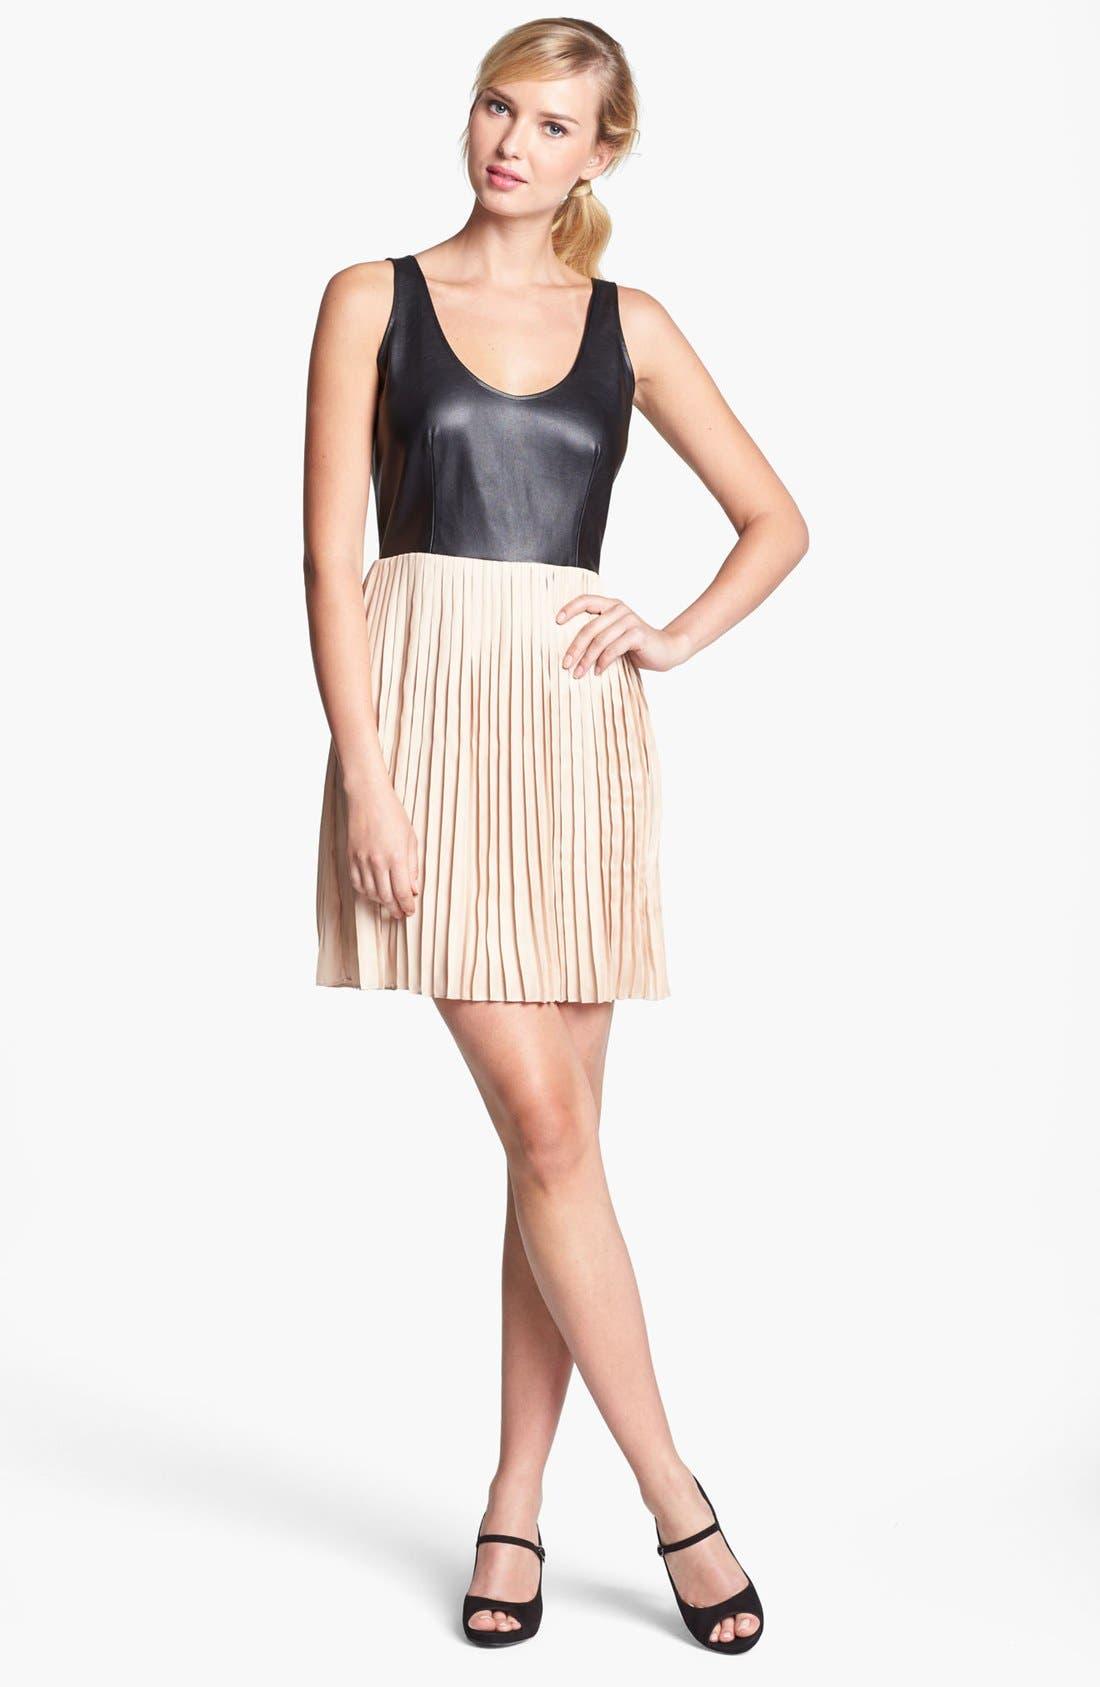 Alternate Image 1 Selected - BB Dakota Faux Leather Bodice & Pleated Skirt Dress (Online Only)